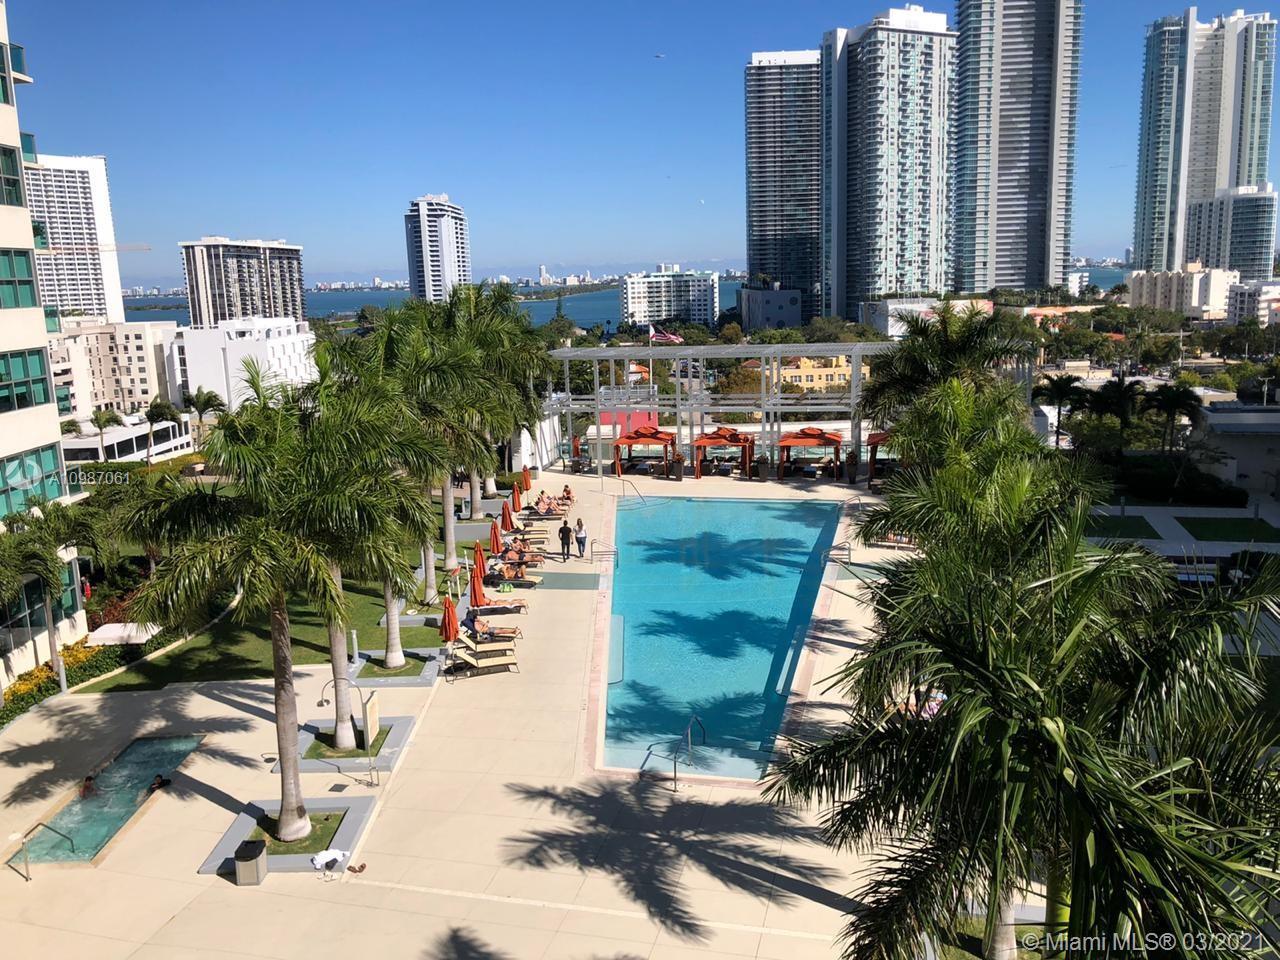 4 Midtown #H1004 - 3301 NE 1st Ave #H1004, Miami, FL 33137